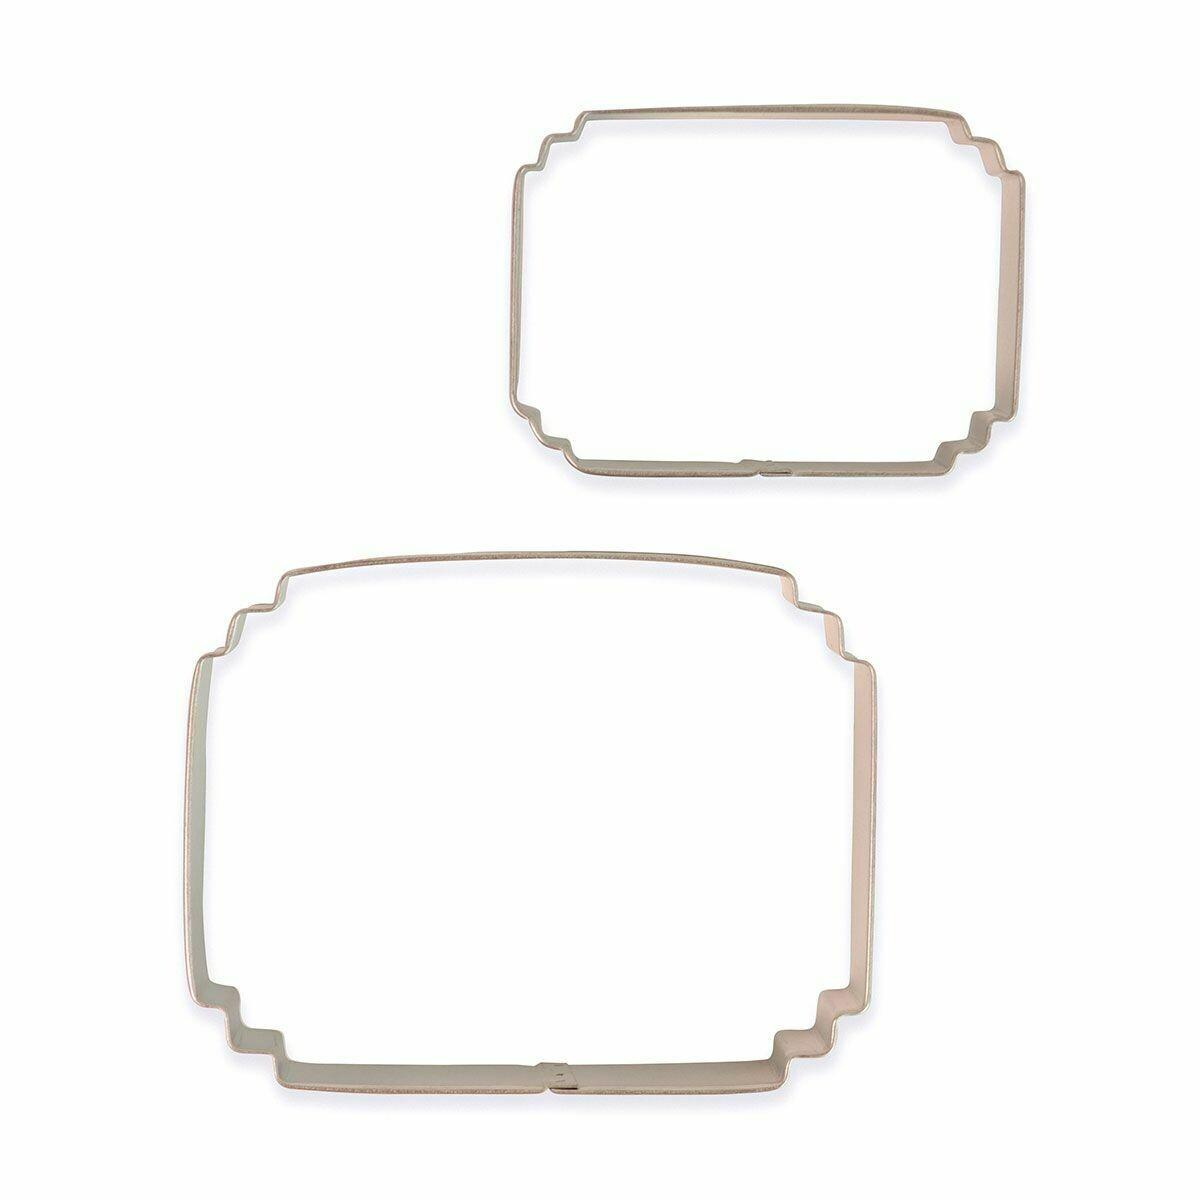 PME Set of 2 Plaque Cutters -STYLE 7 - Σετ 2τεμ κουπ πατ Κορνίζες/πλάκες